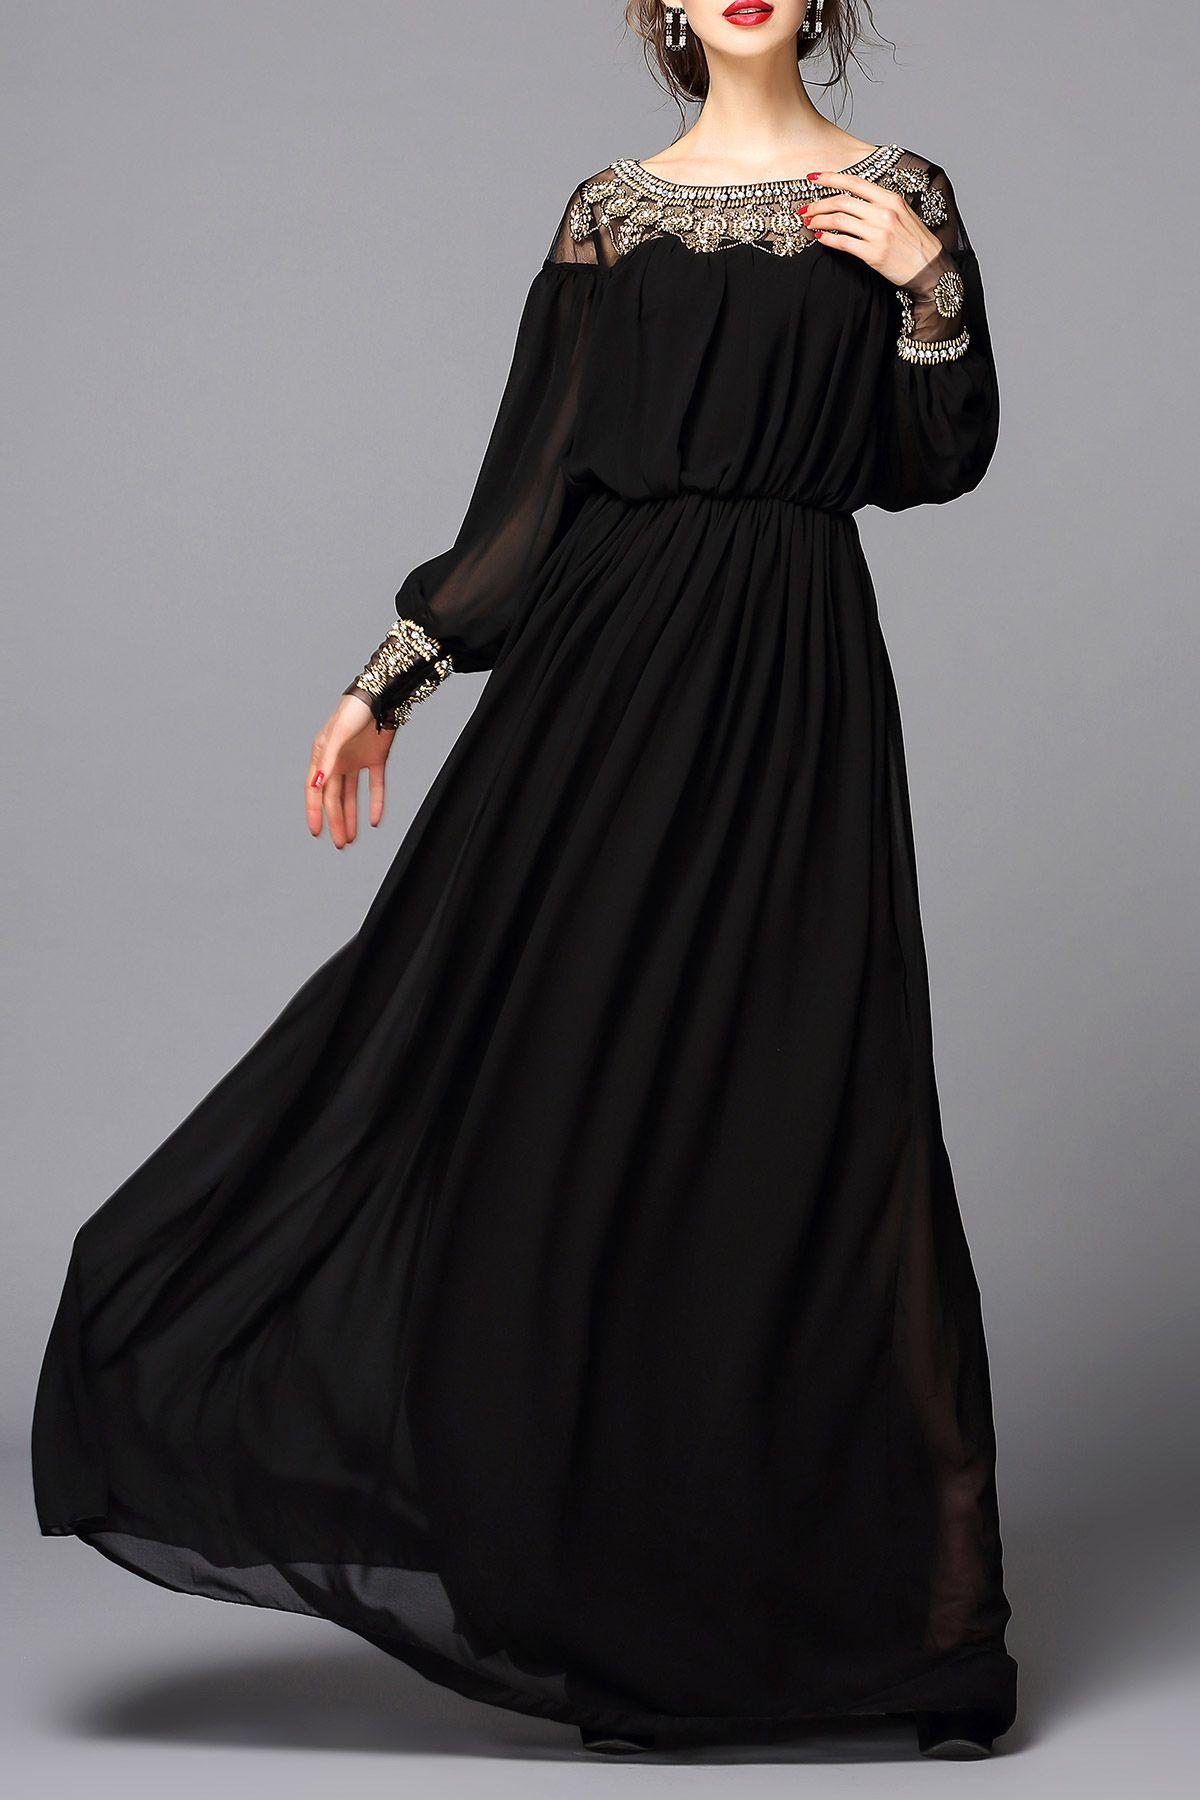 Beaded evening dress udud my style pinterest beads maxi dresses